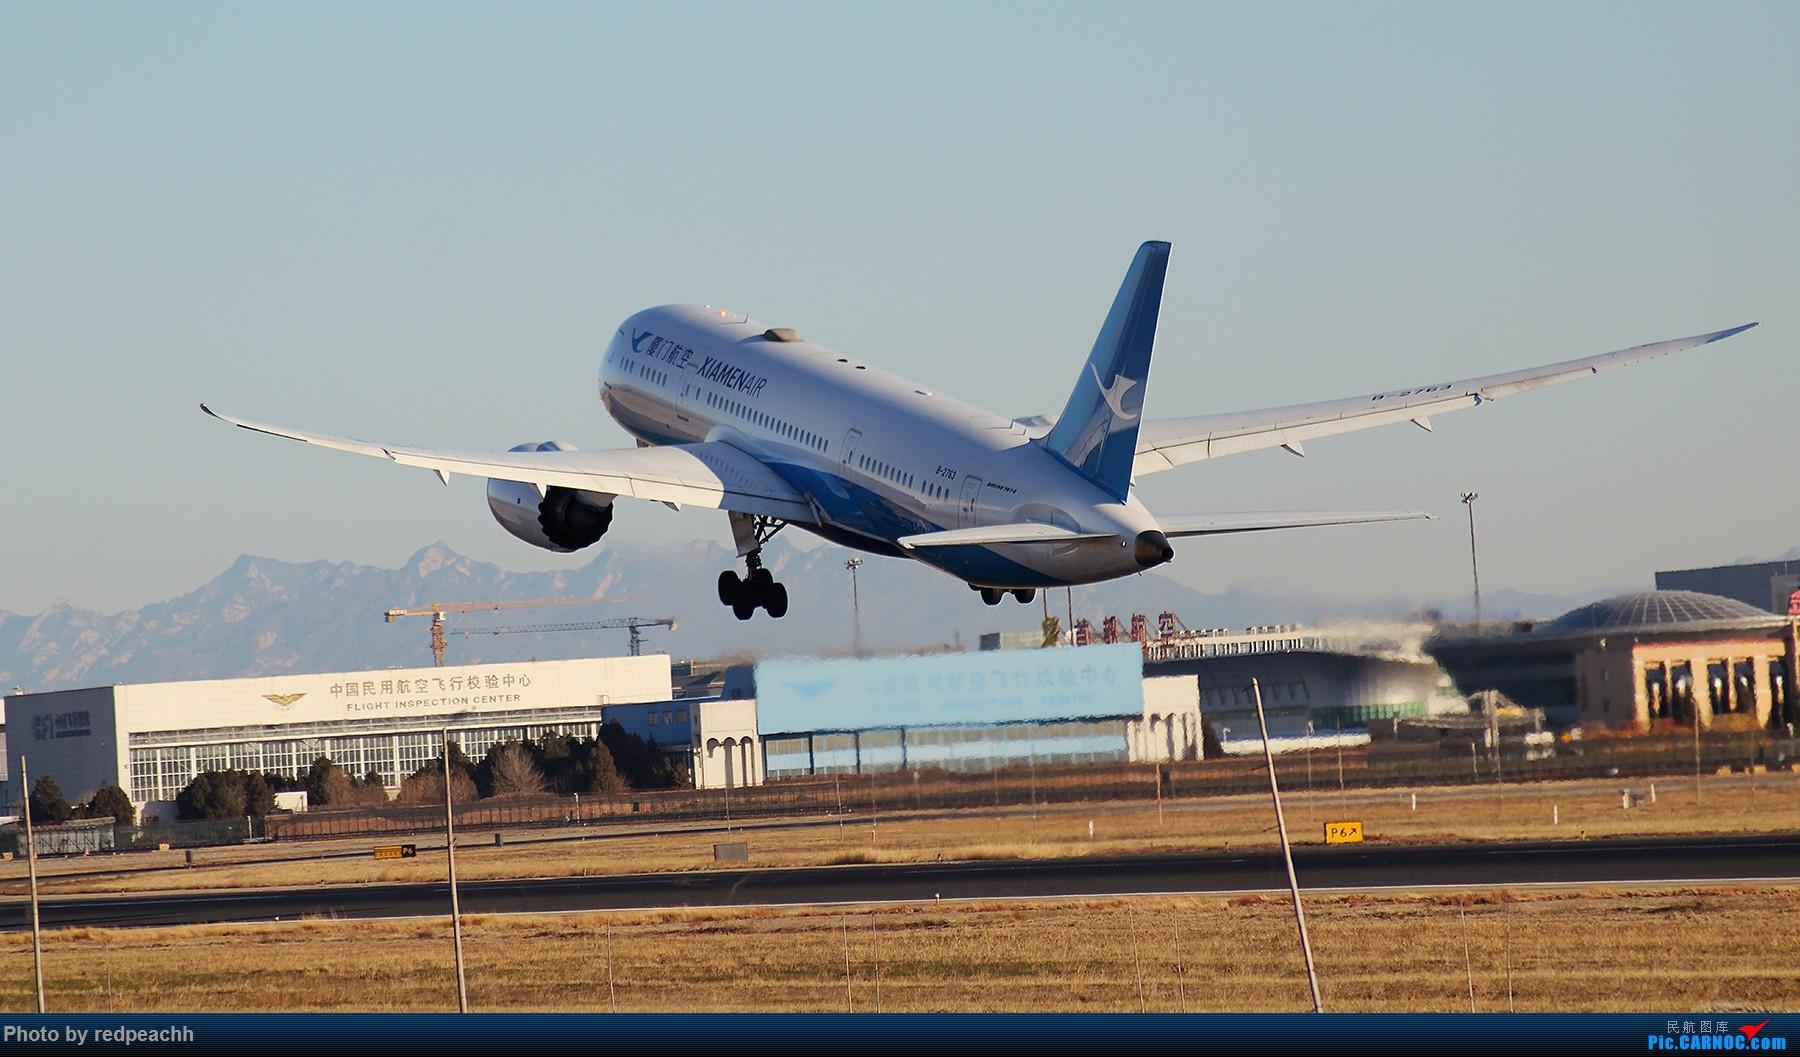 Re:[原创](持续更新)河北人为拍机而首都机场2日游(杨二营、八卦台)虽均为常规货但值得纪念(36L) BOEING 787-8 B-2763 中国北京首都国际机场